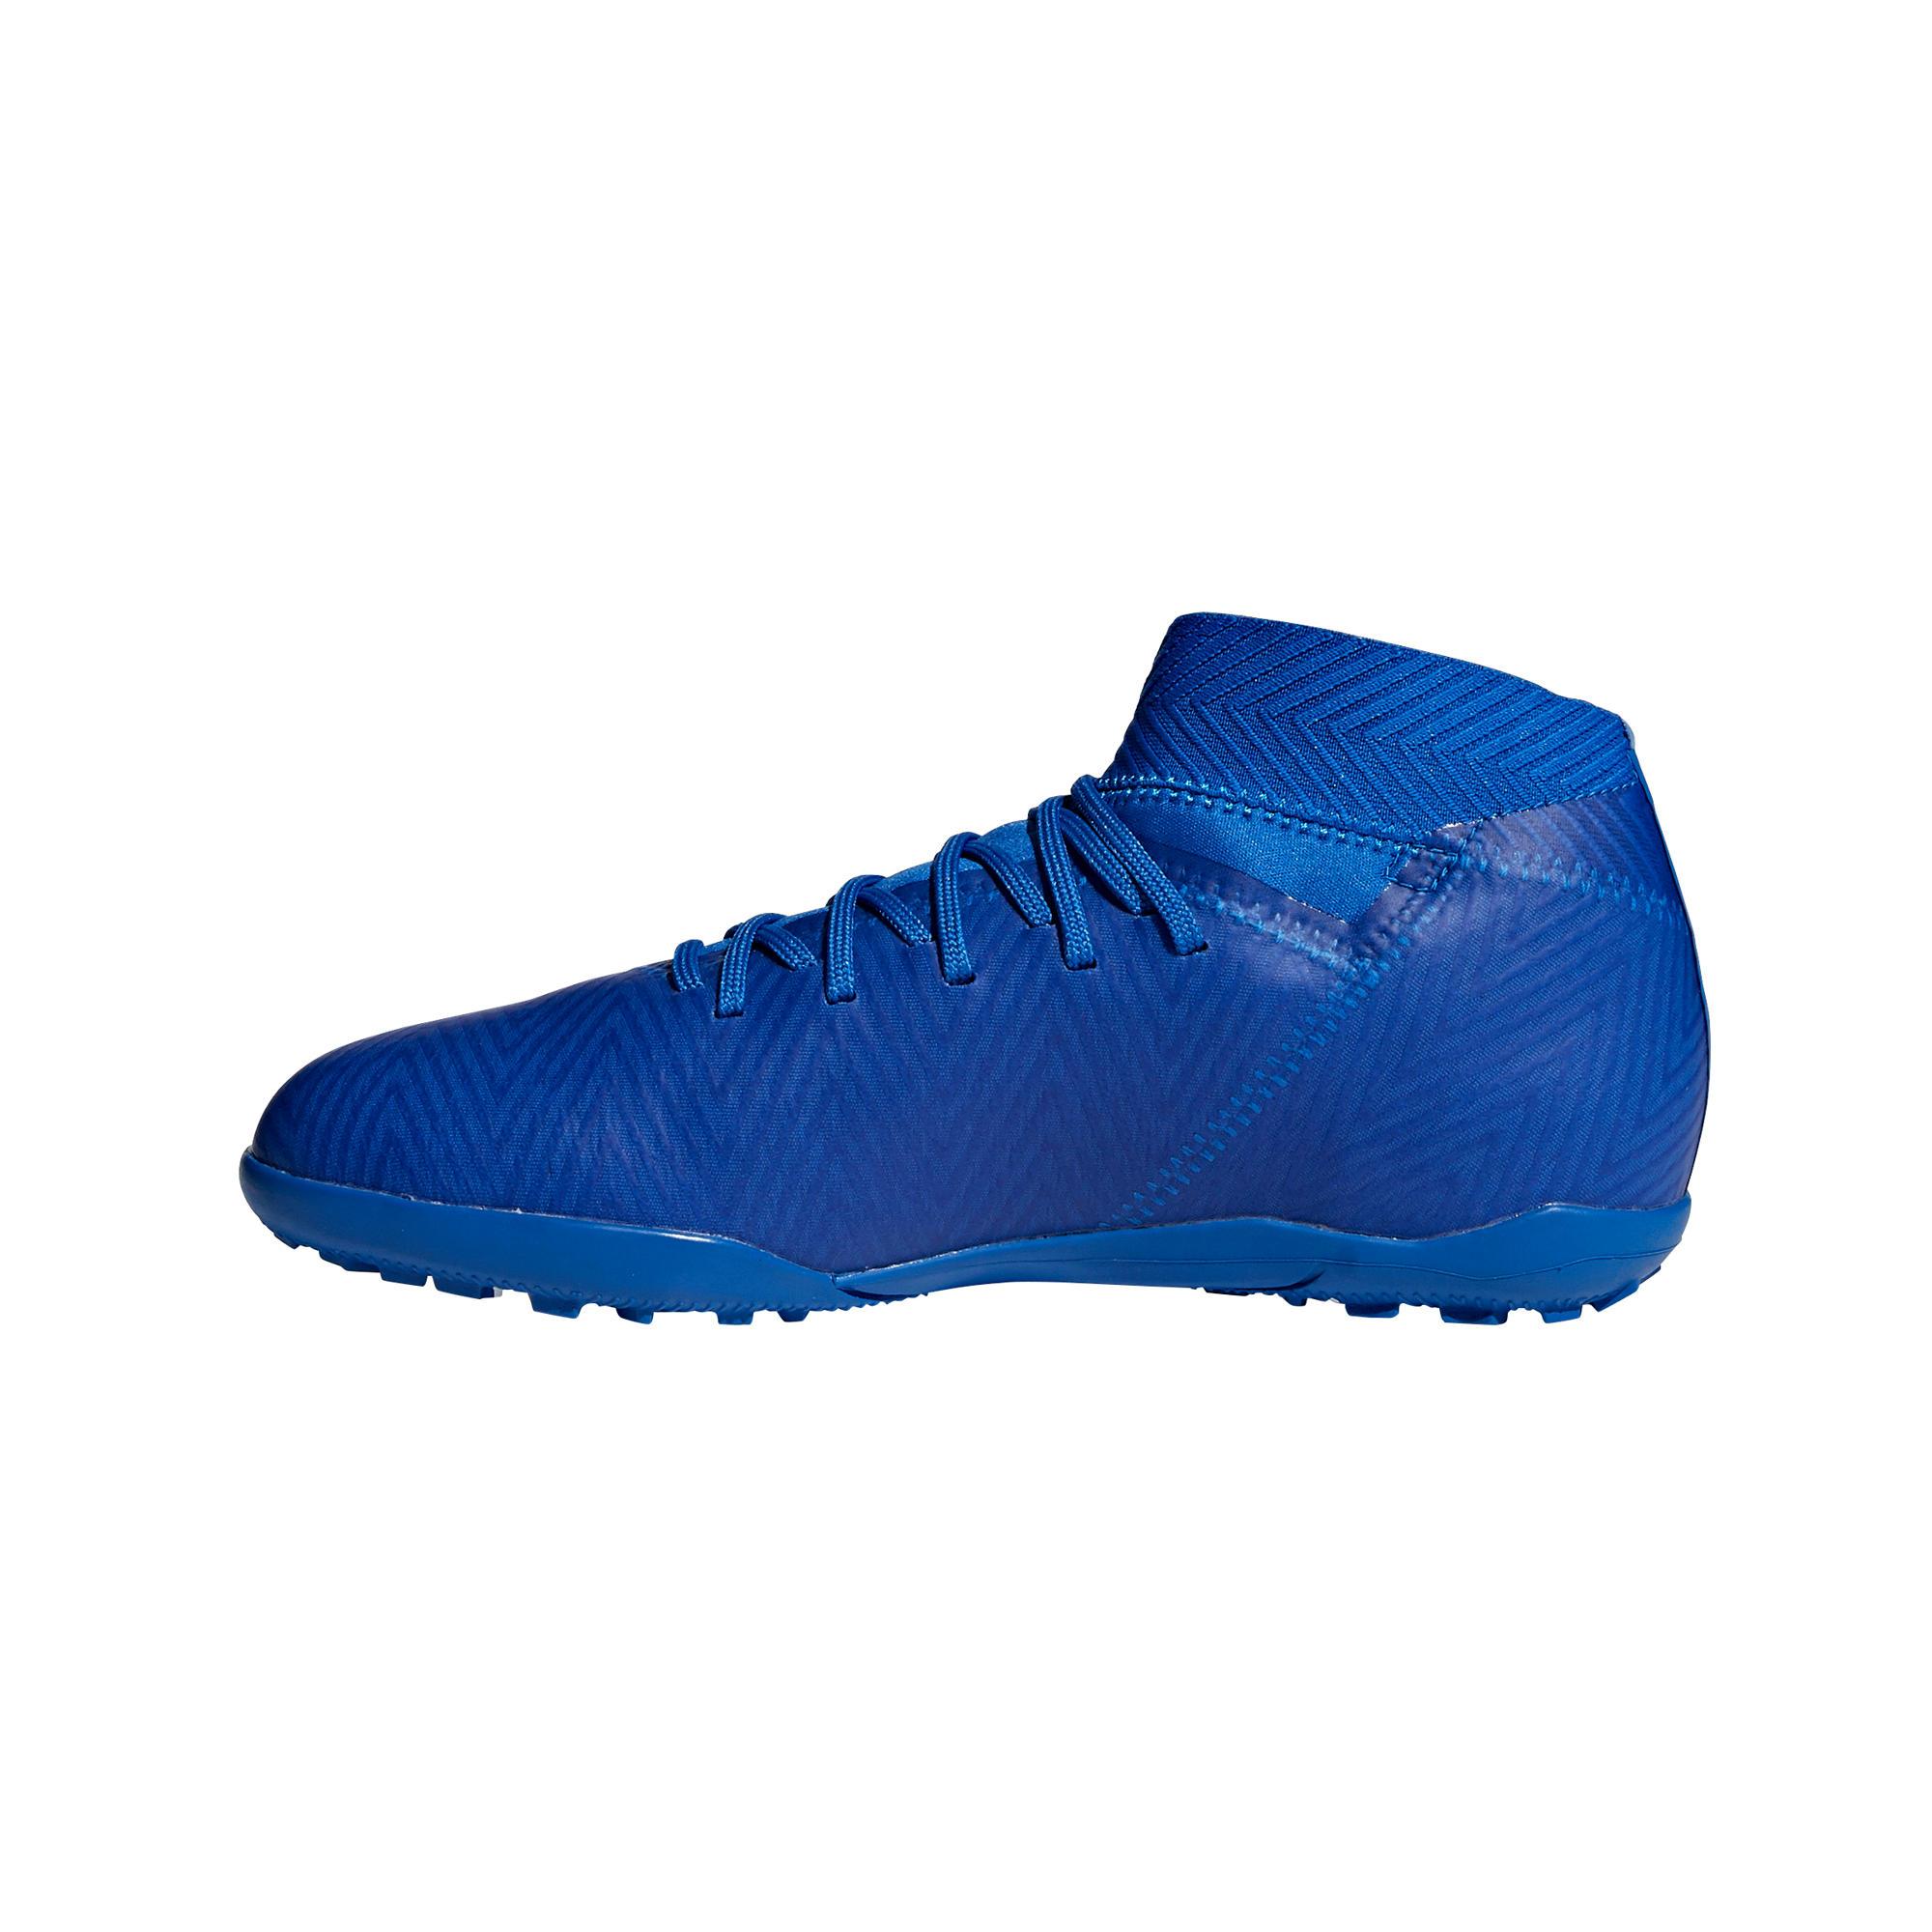 adidas nemezis blu